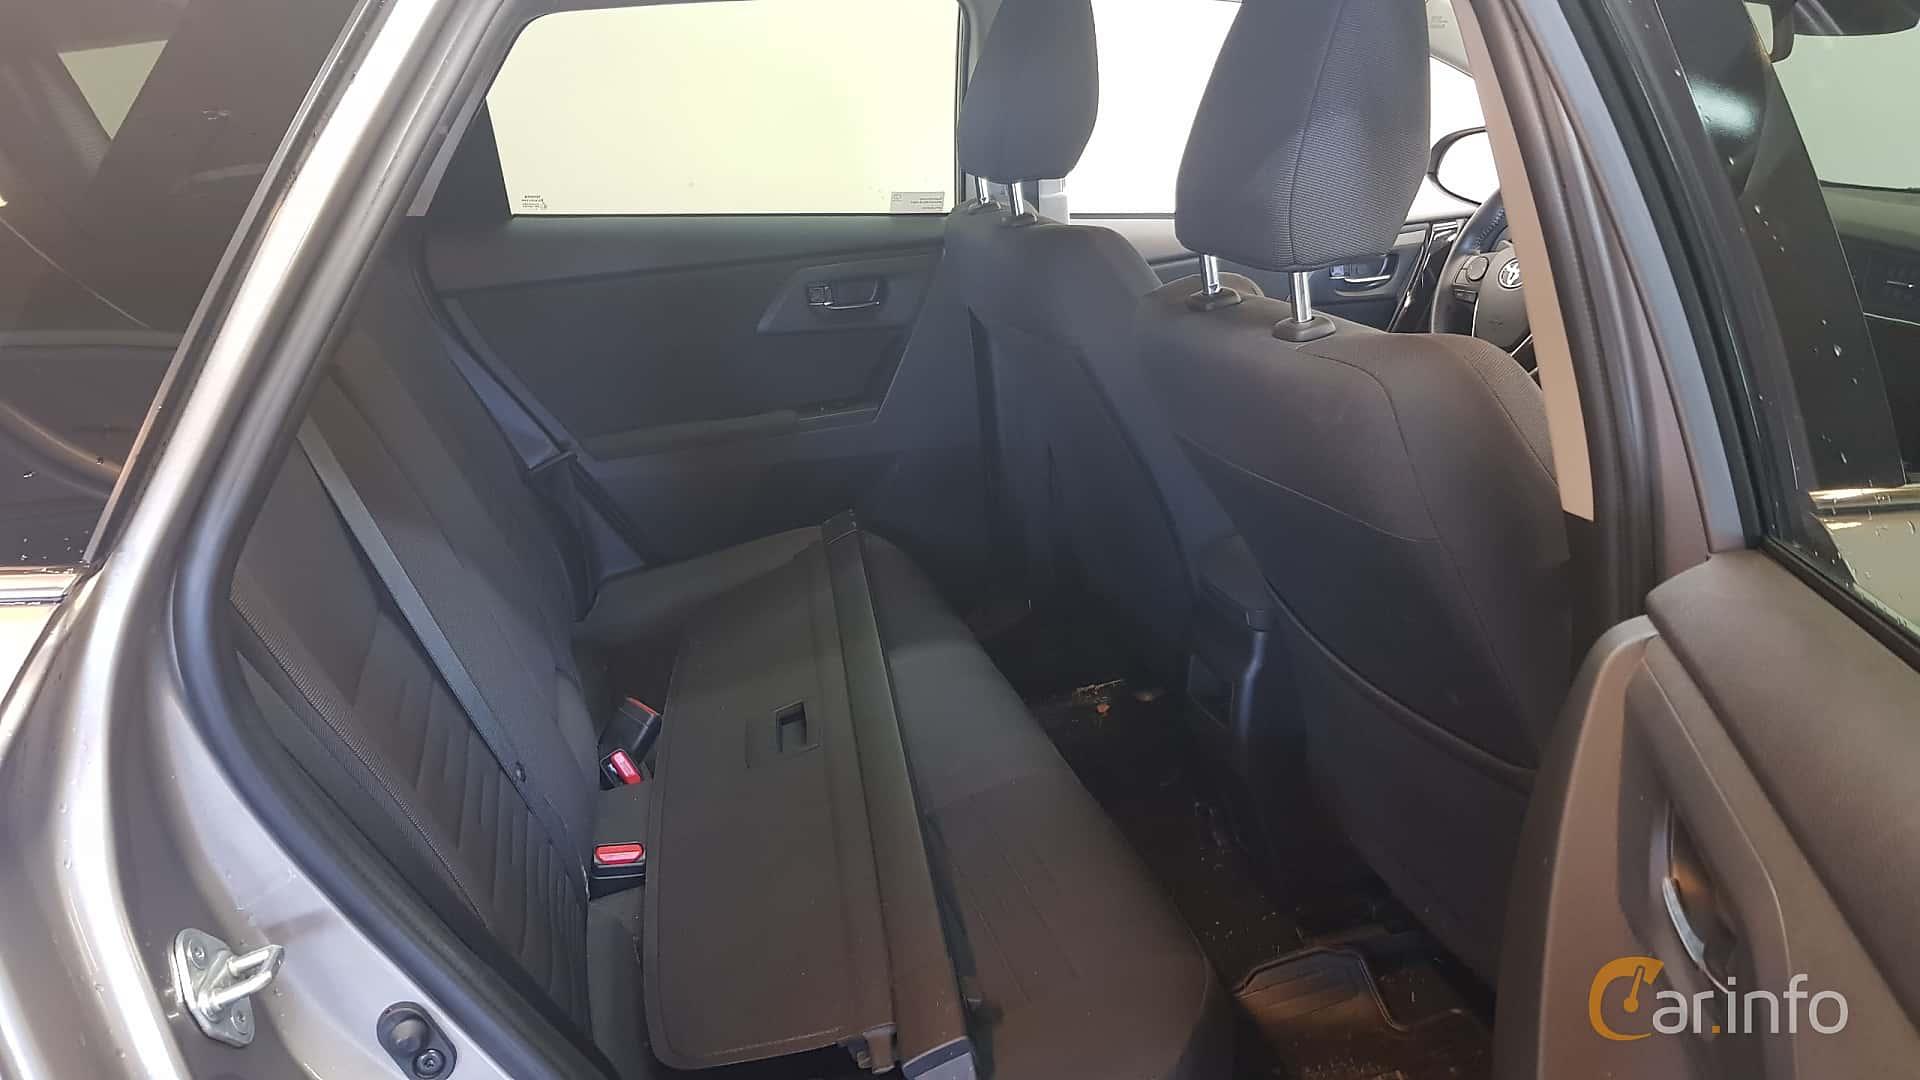 toyota-auris-touring-sports-interior-2-502399.jpg